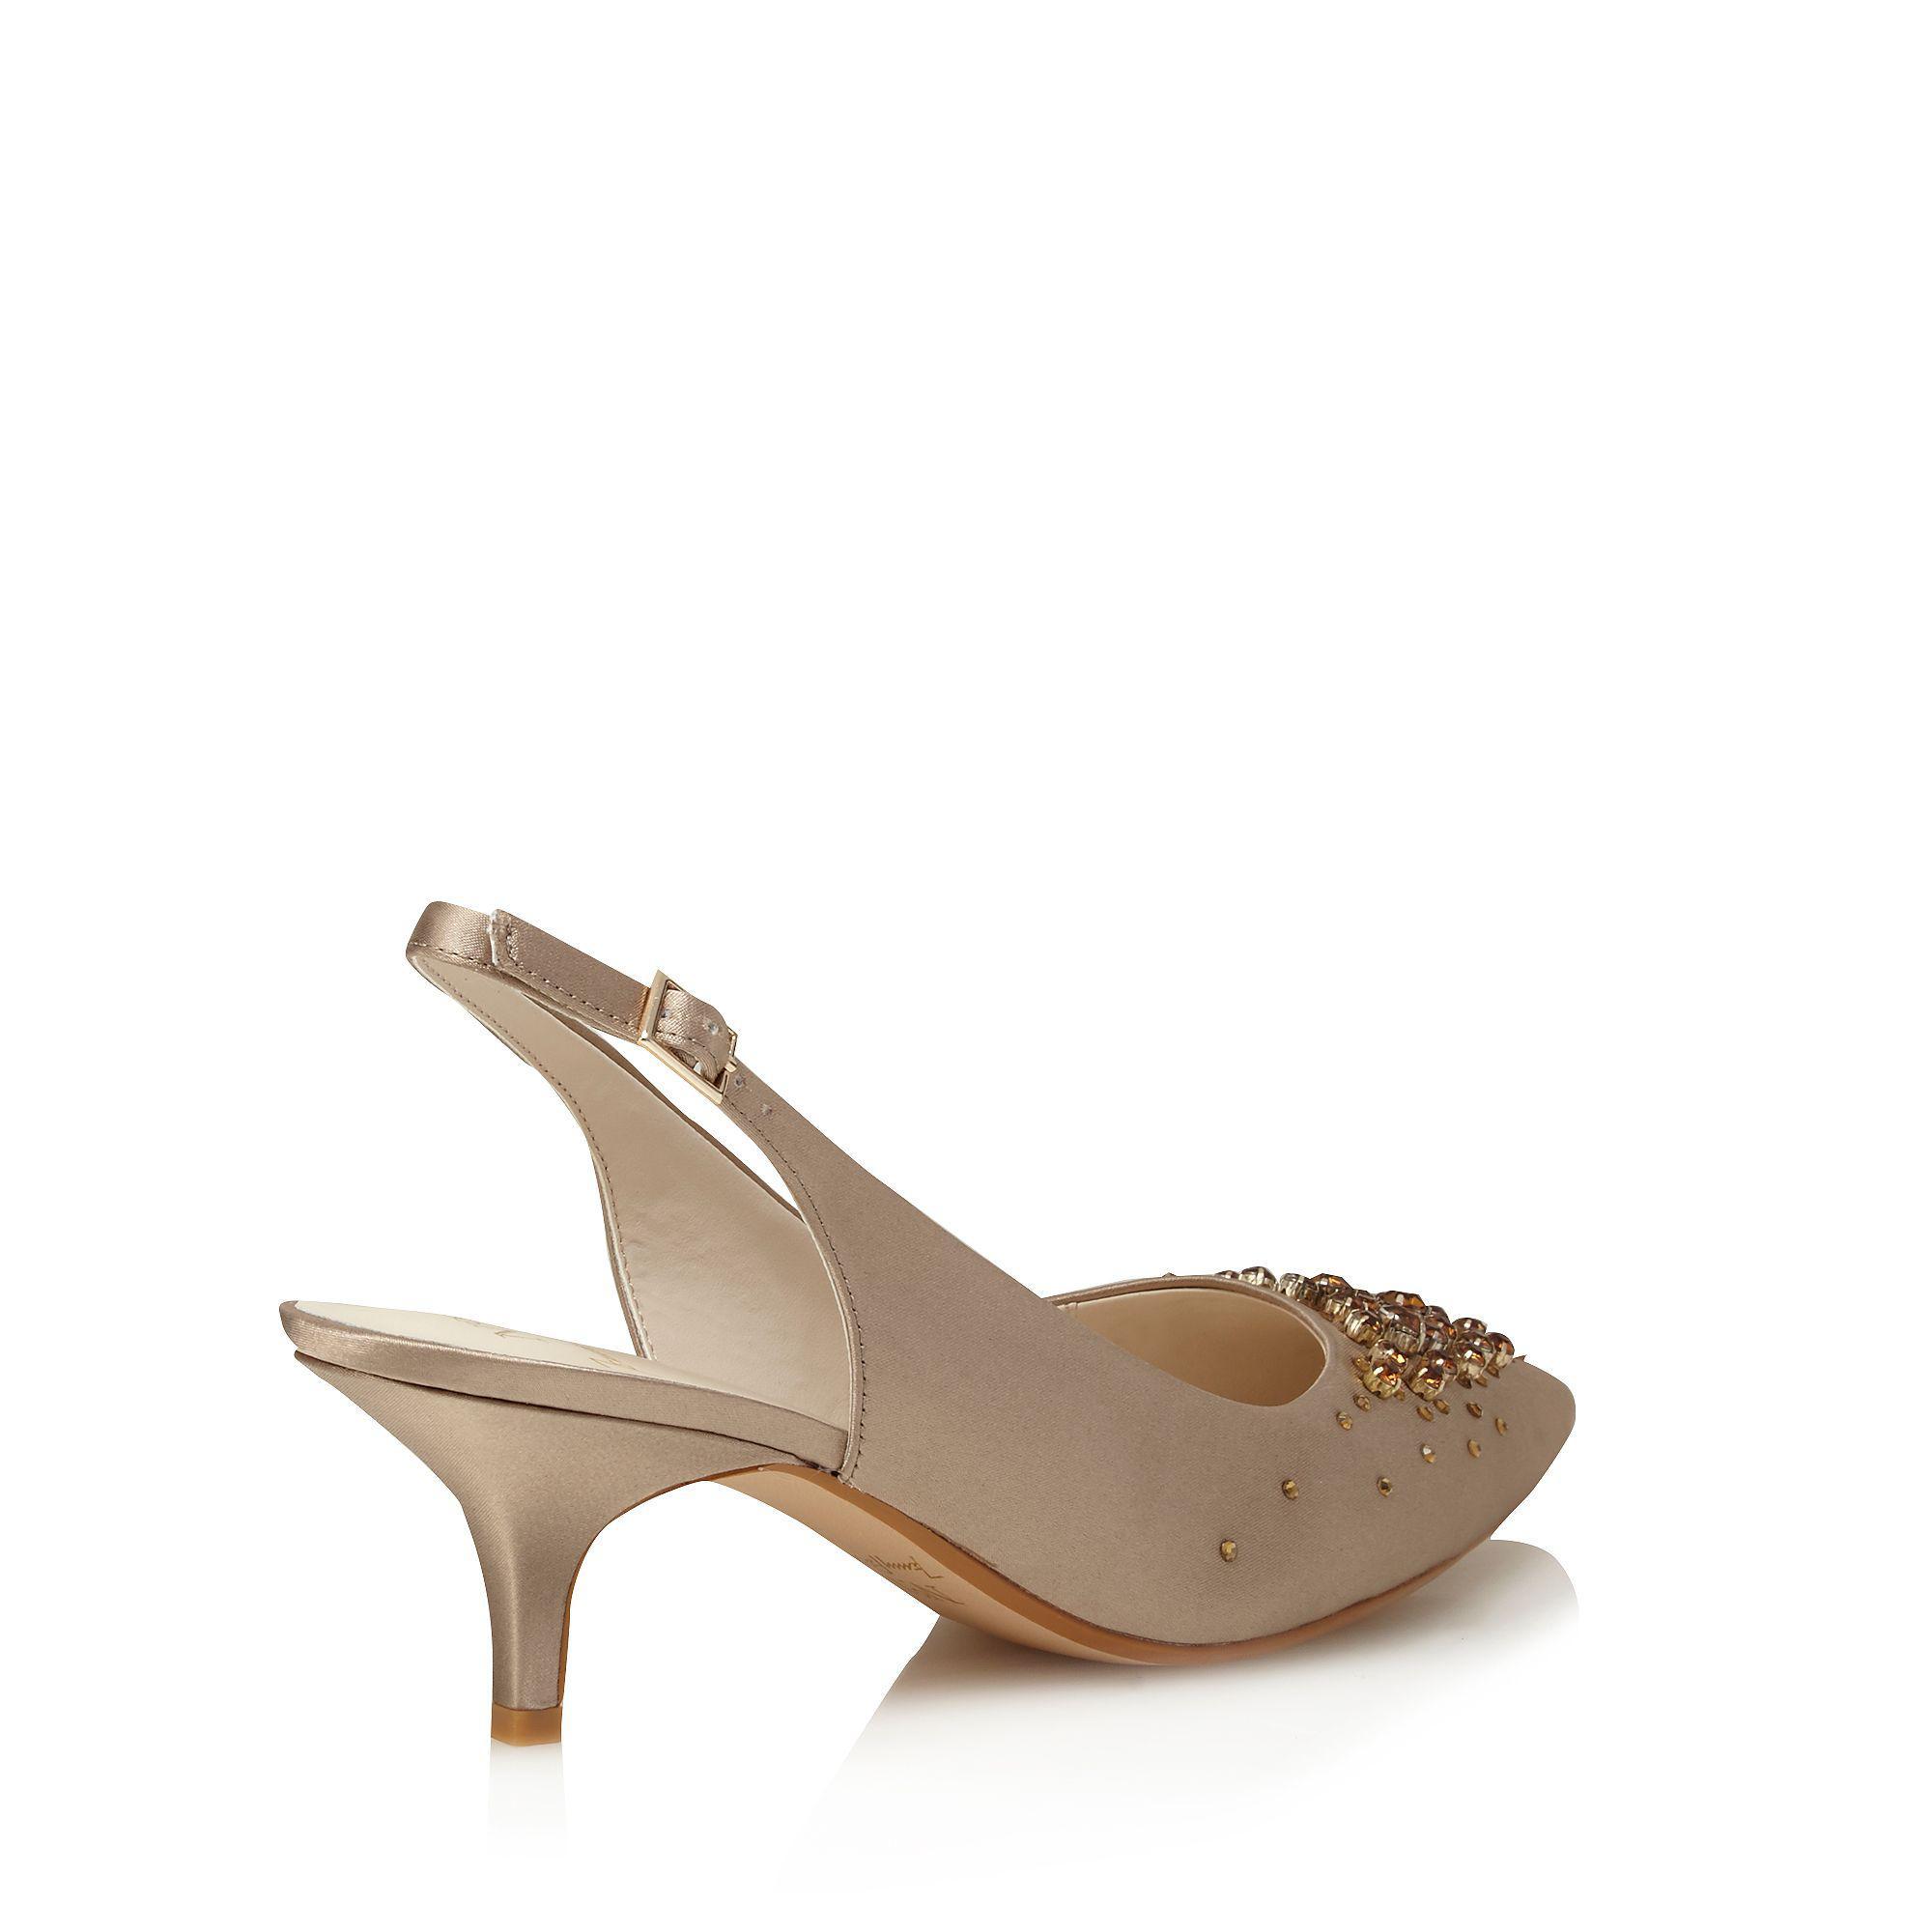 809402fb192 Jenny Packham Blush Satin  pamela  High Stiletto Heel Slingbacks in ...